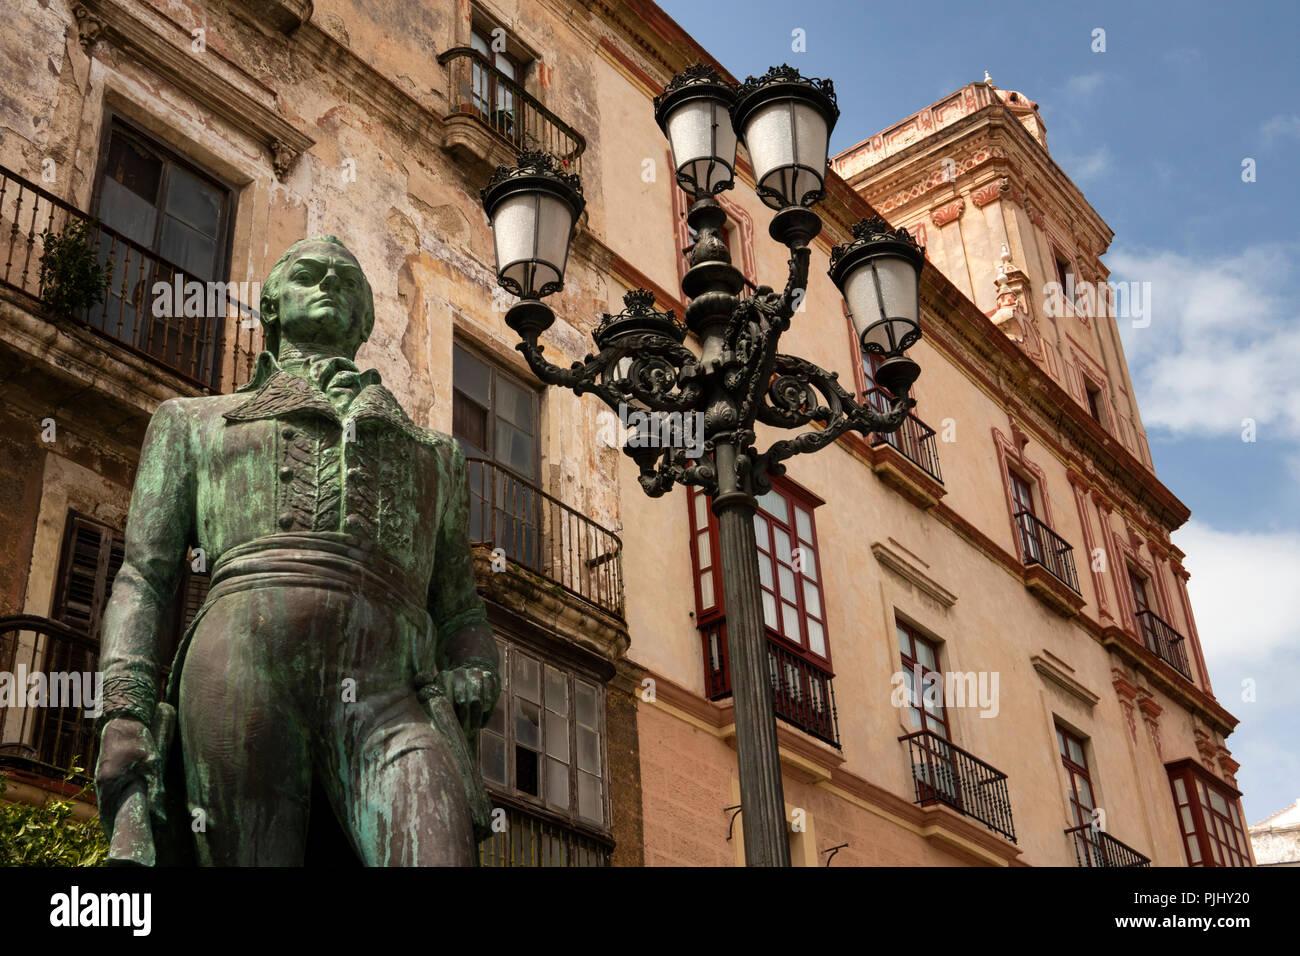 Spain, Cadiz, Statue of Francisco de Miranda, hero of American Independence, died in Cadiz 1816  - Stock Image